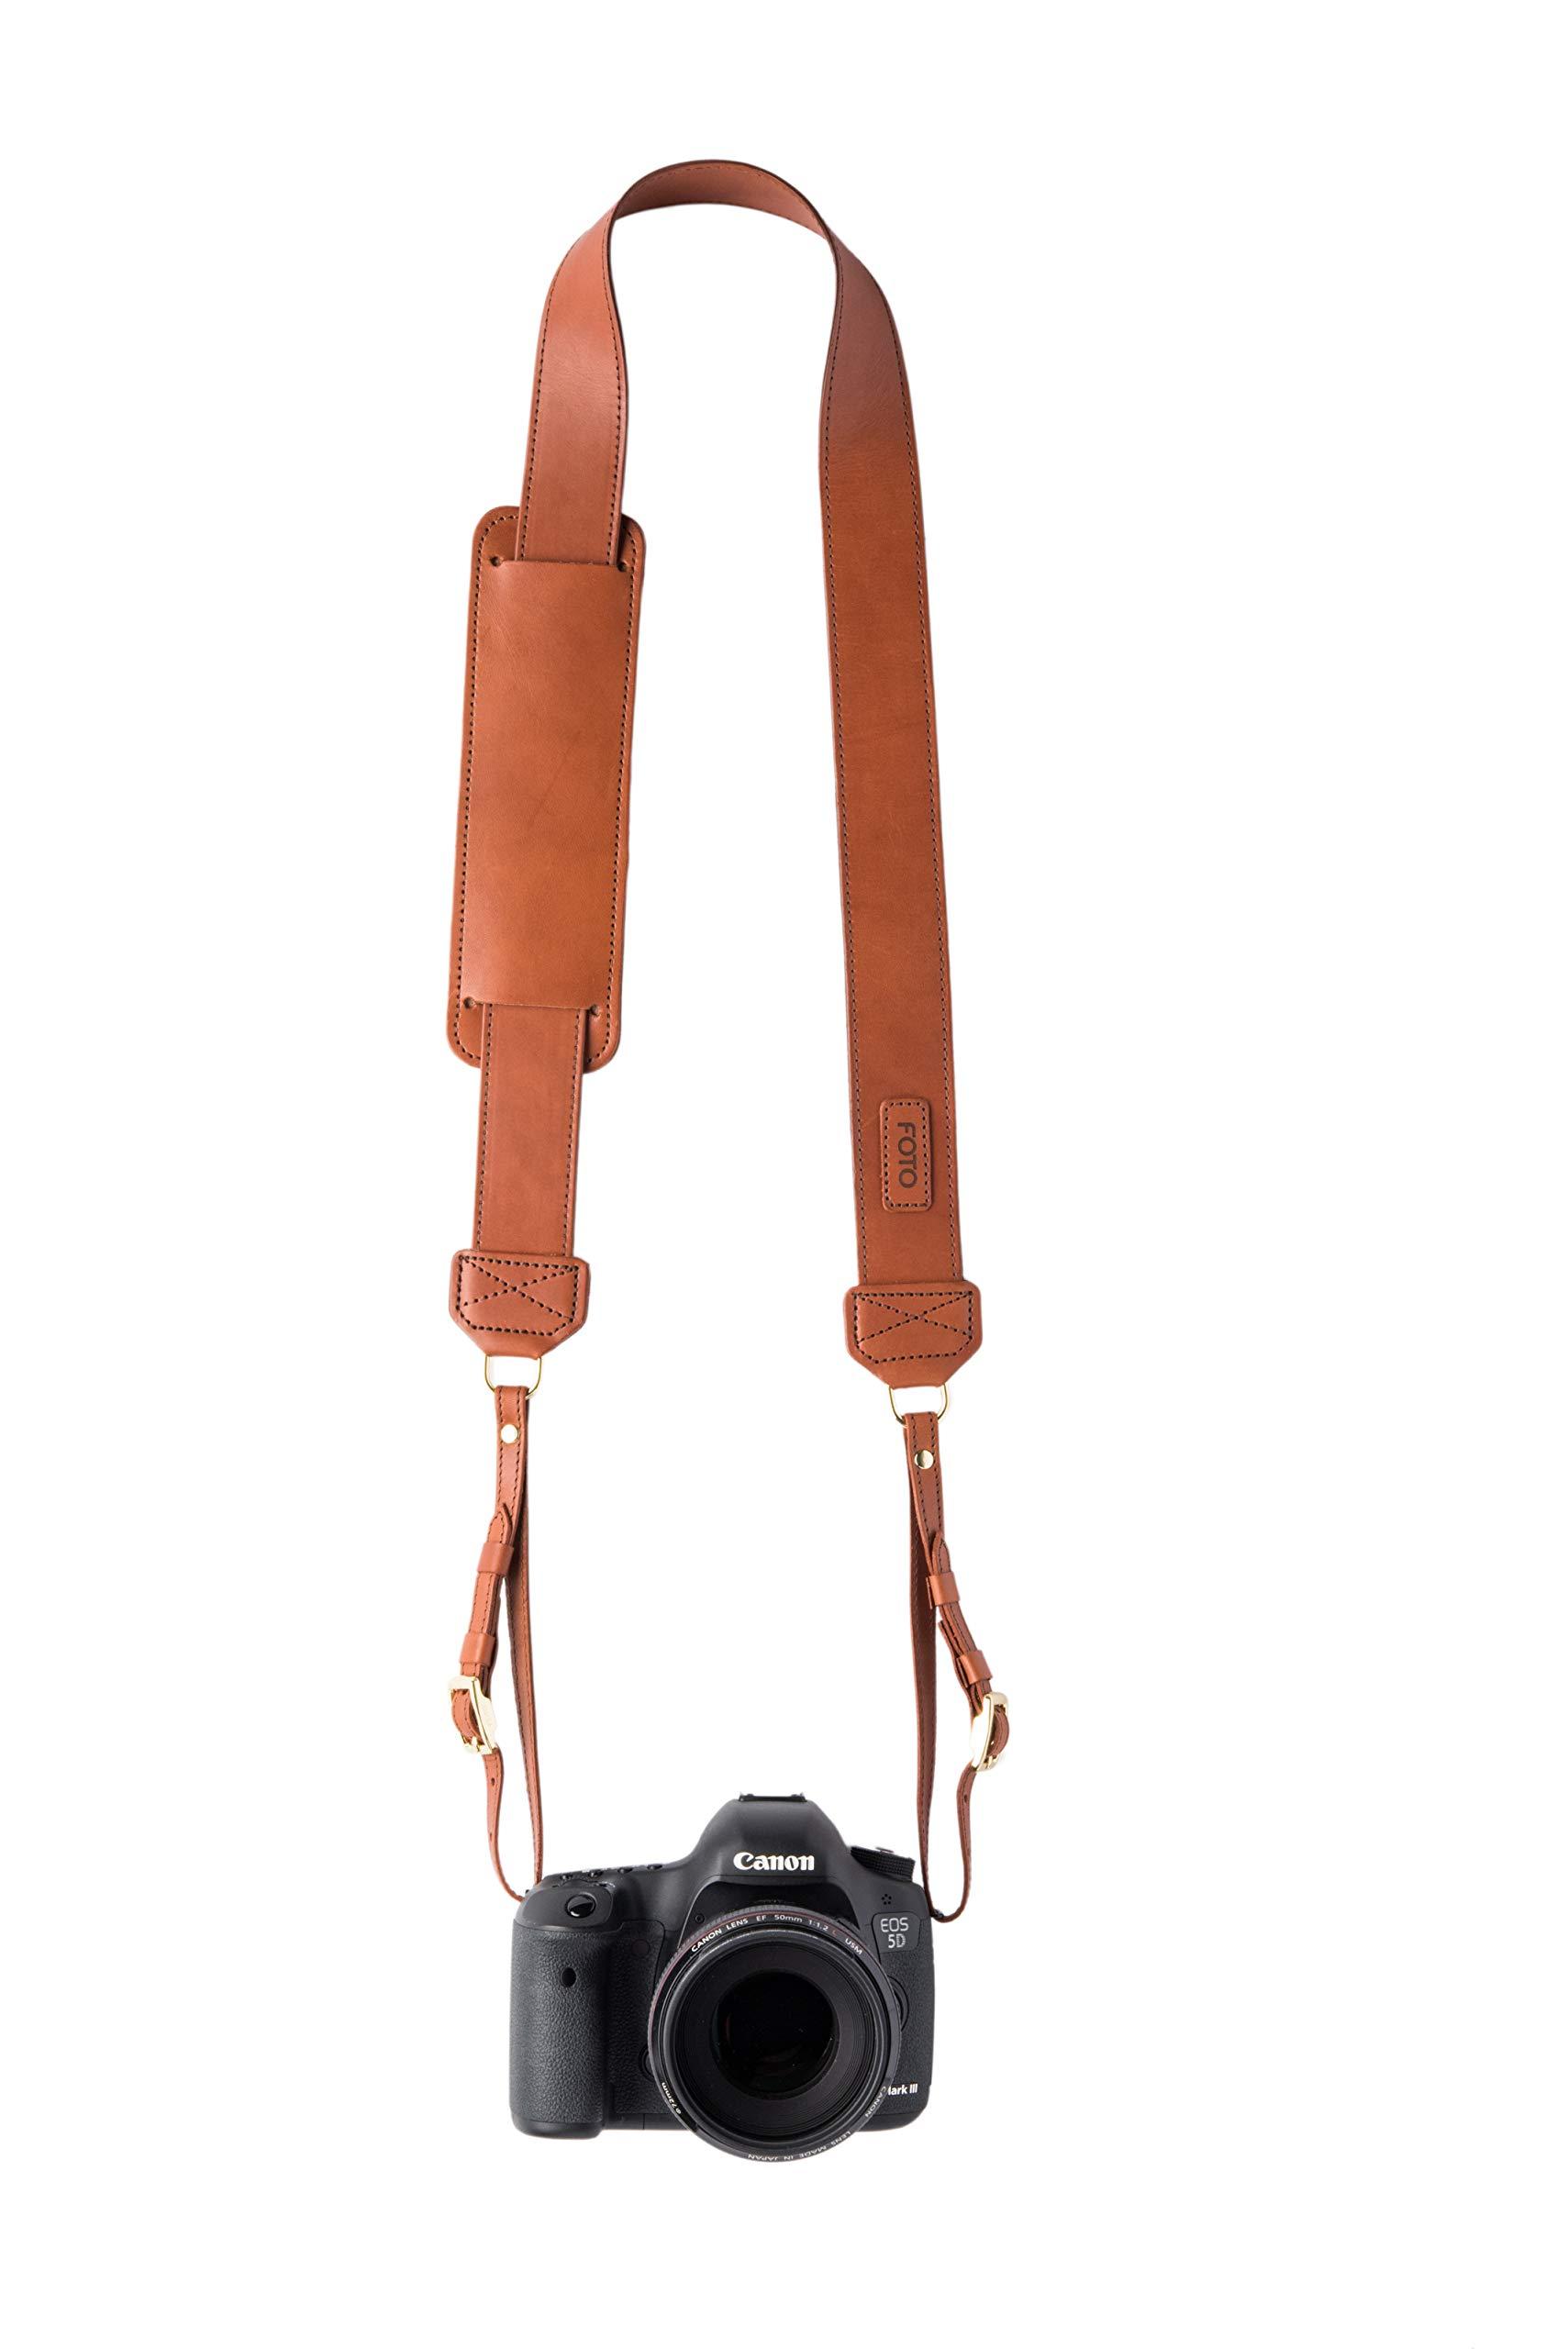 James Fotostrap Leather Camera Strap by Fotostrap